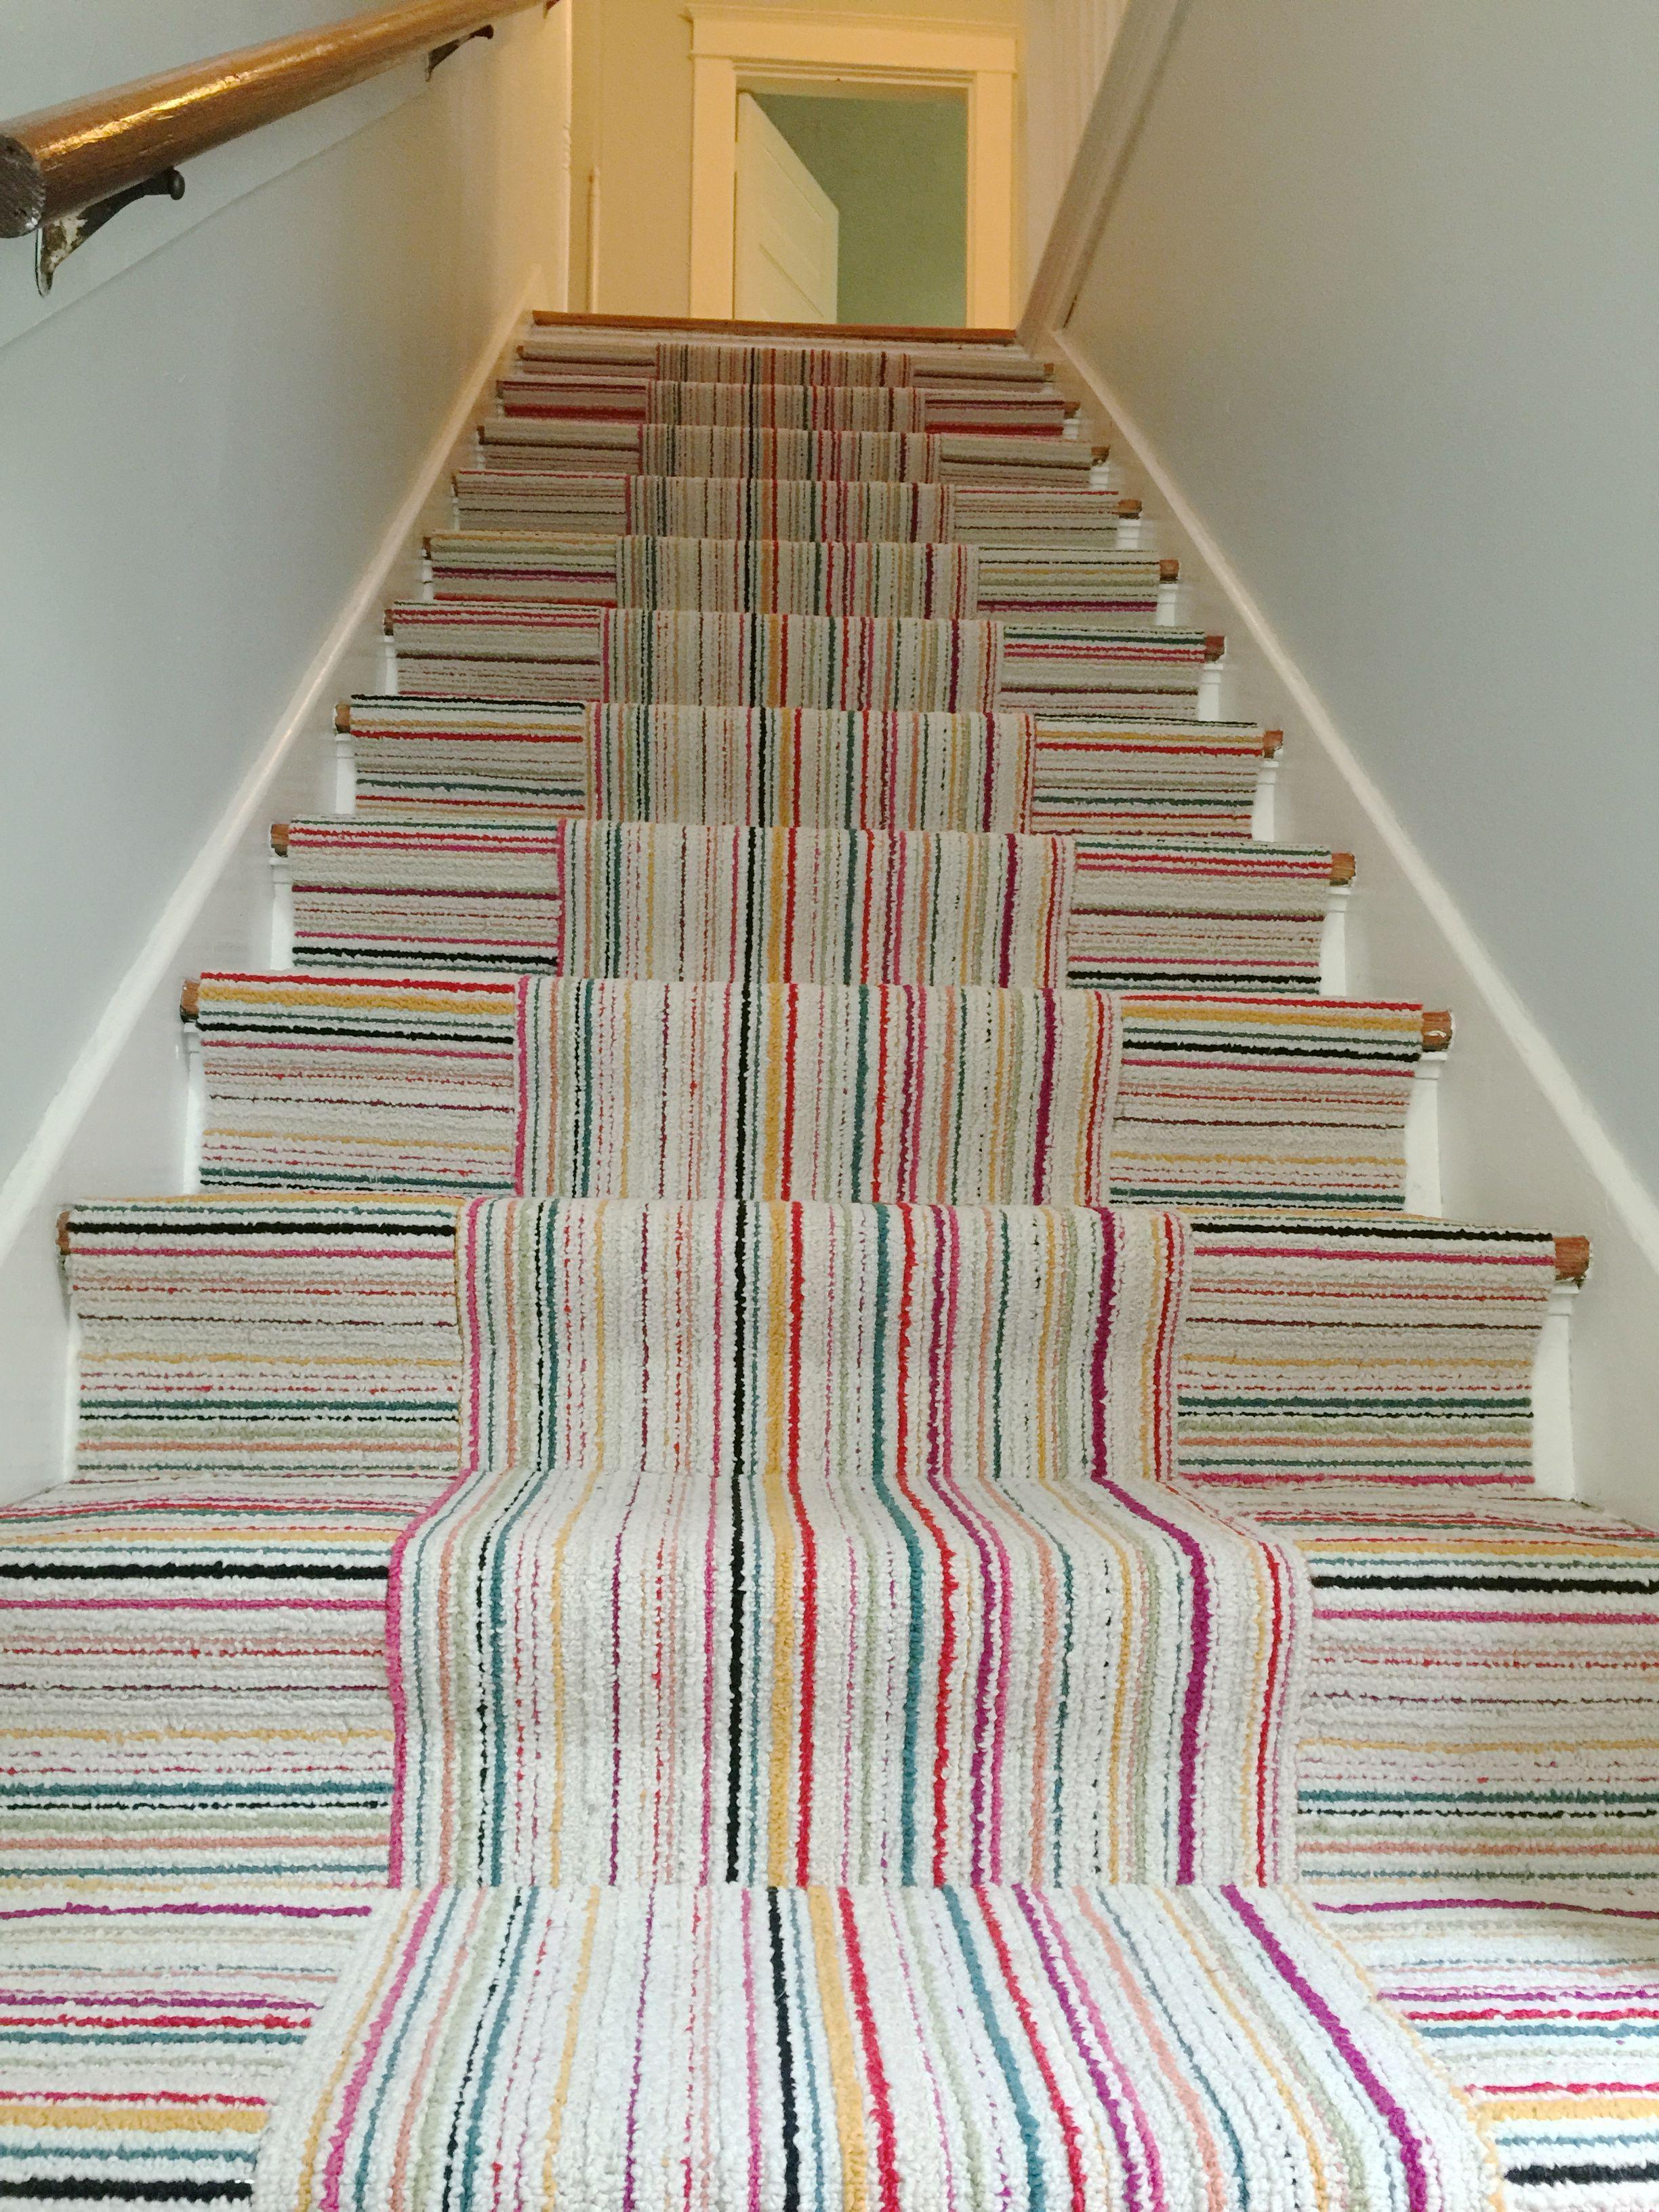 search flor carpet tiles on stairstile design ideas